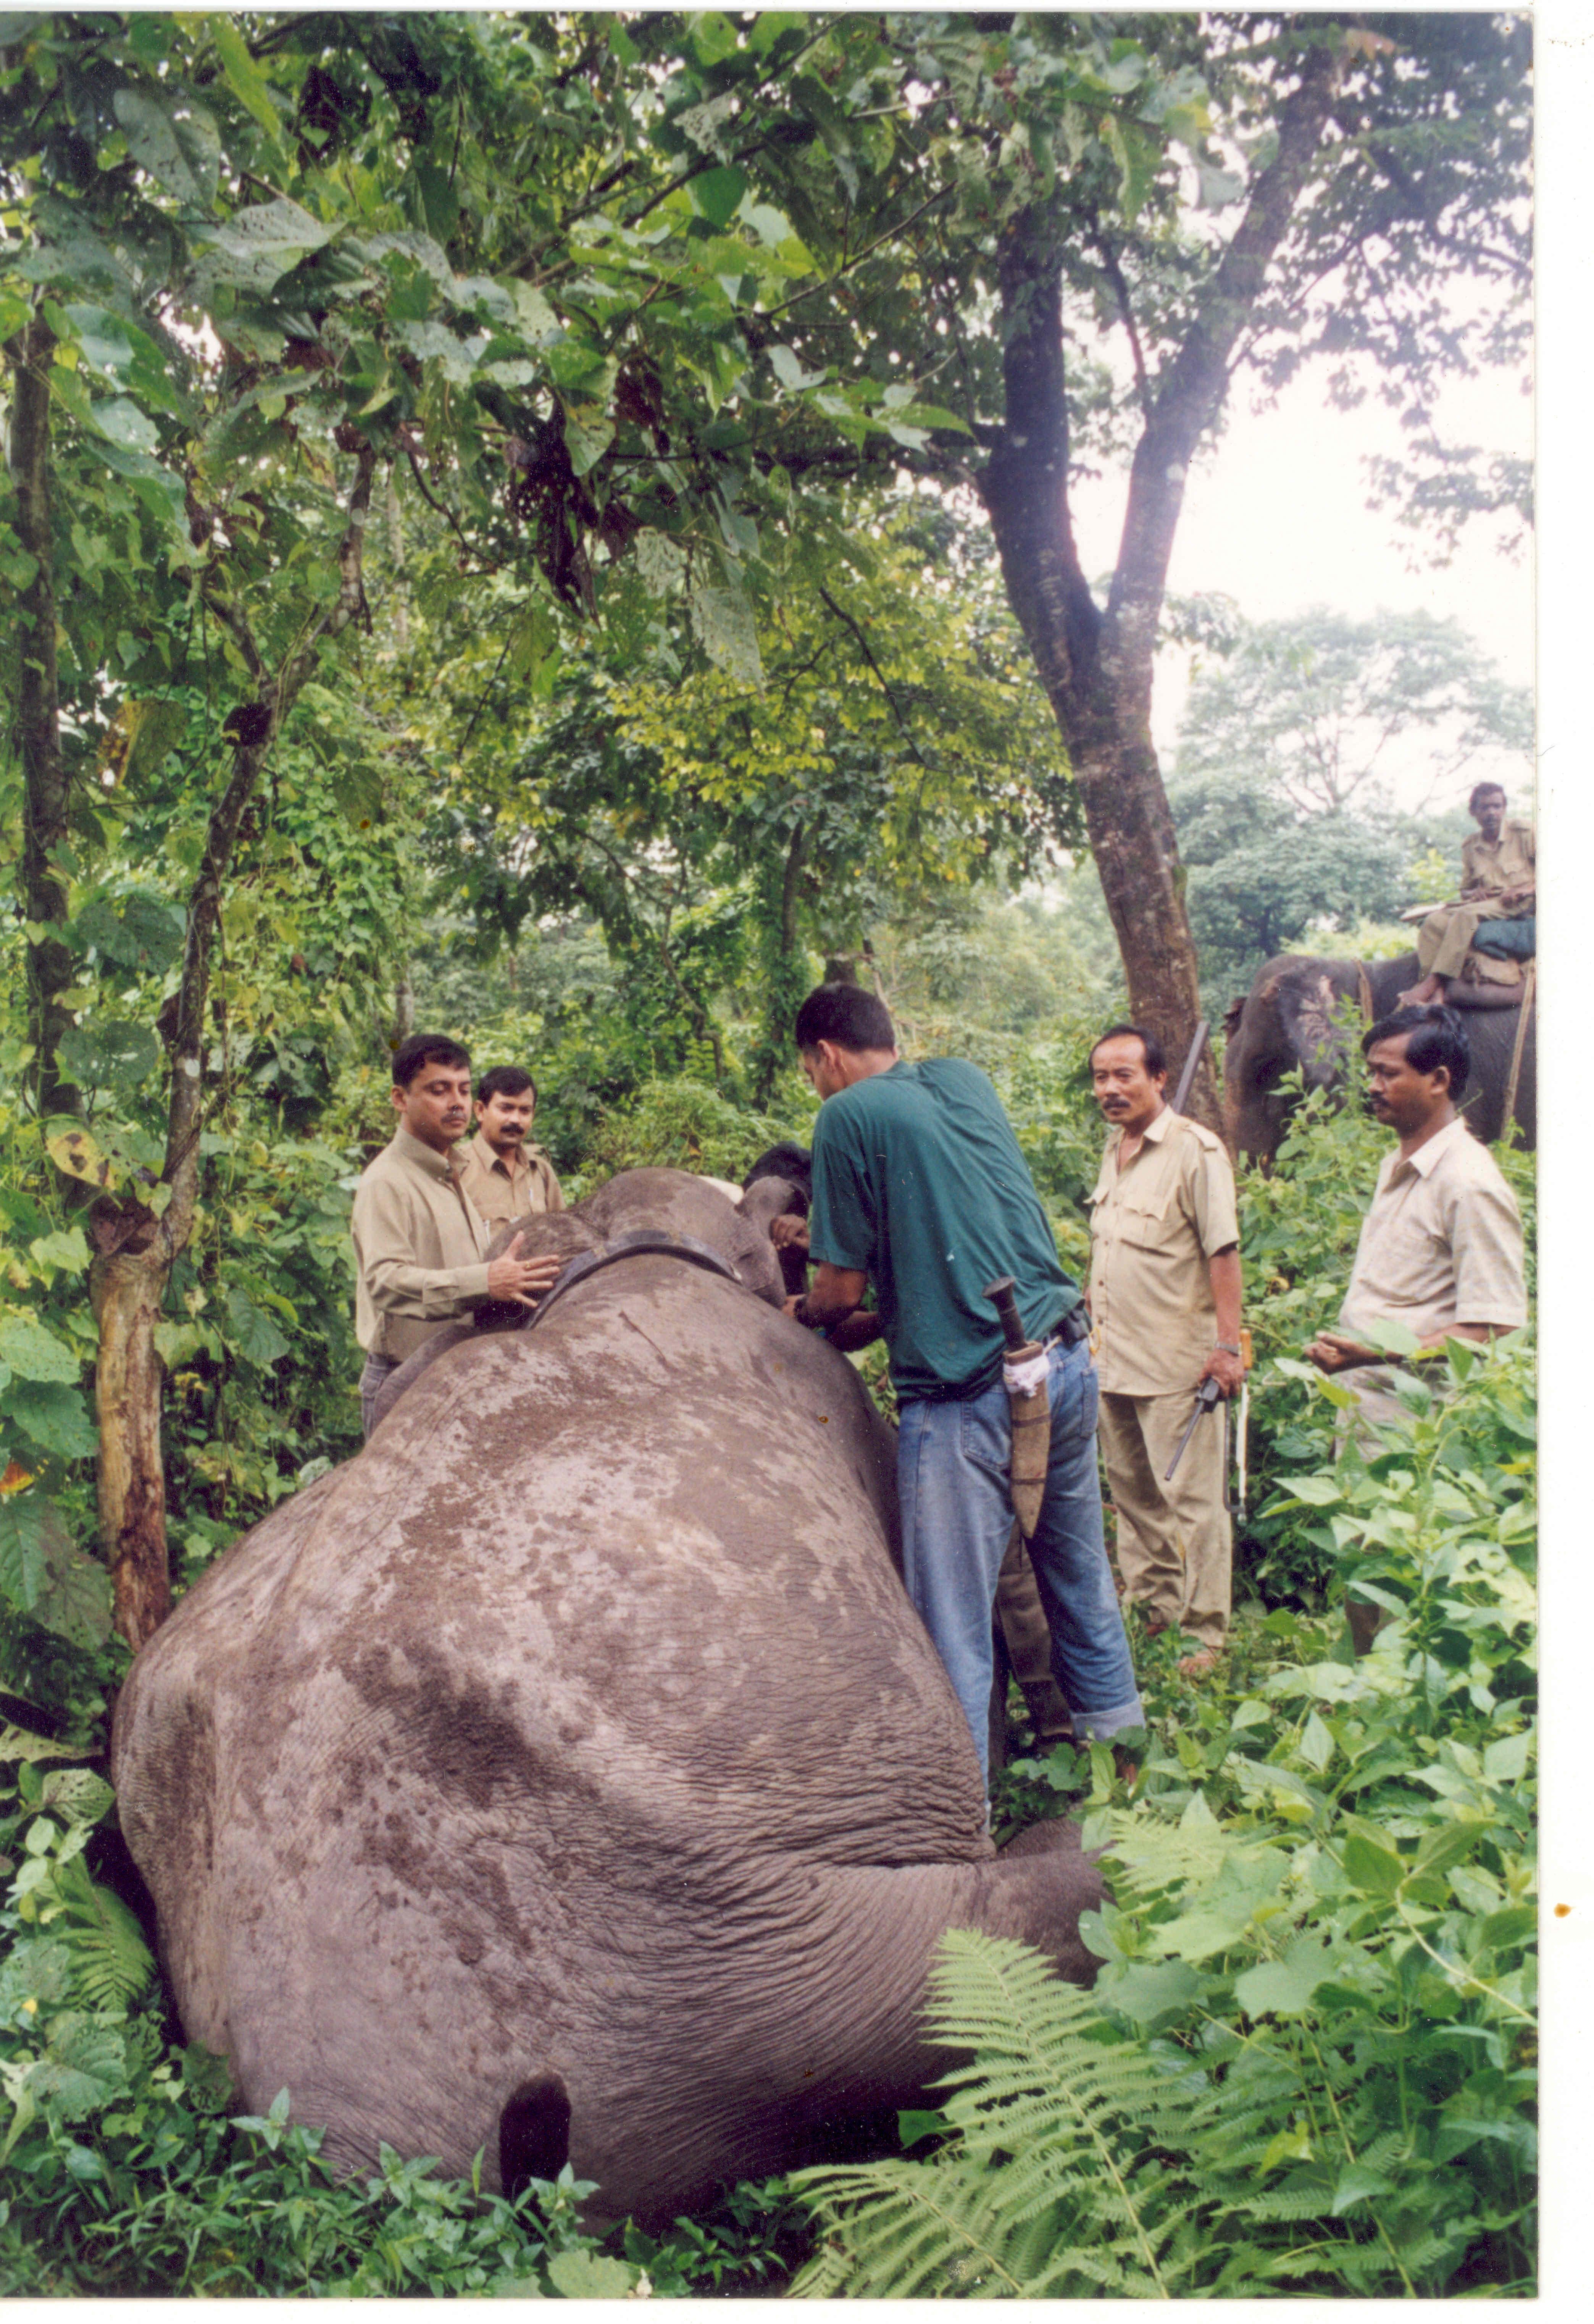 Radio collaring of an elephant photo